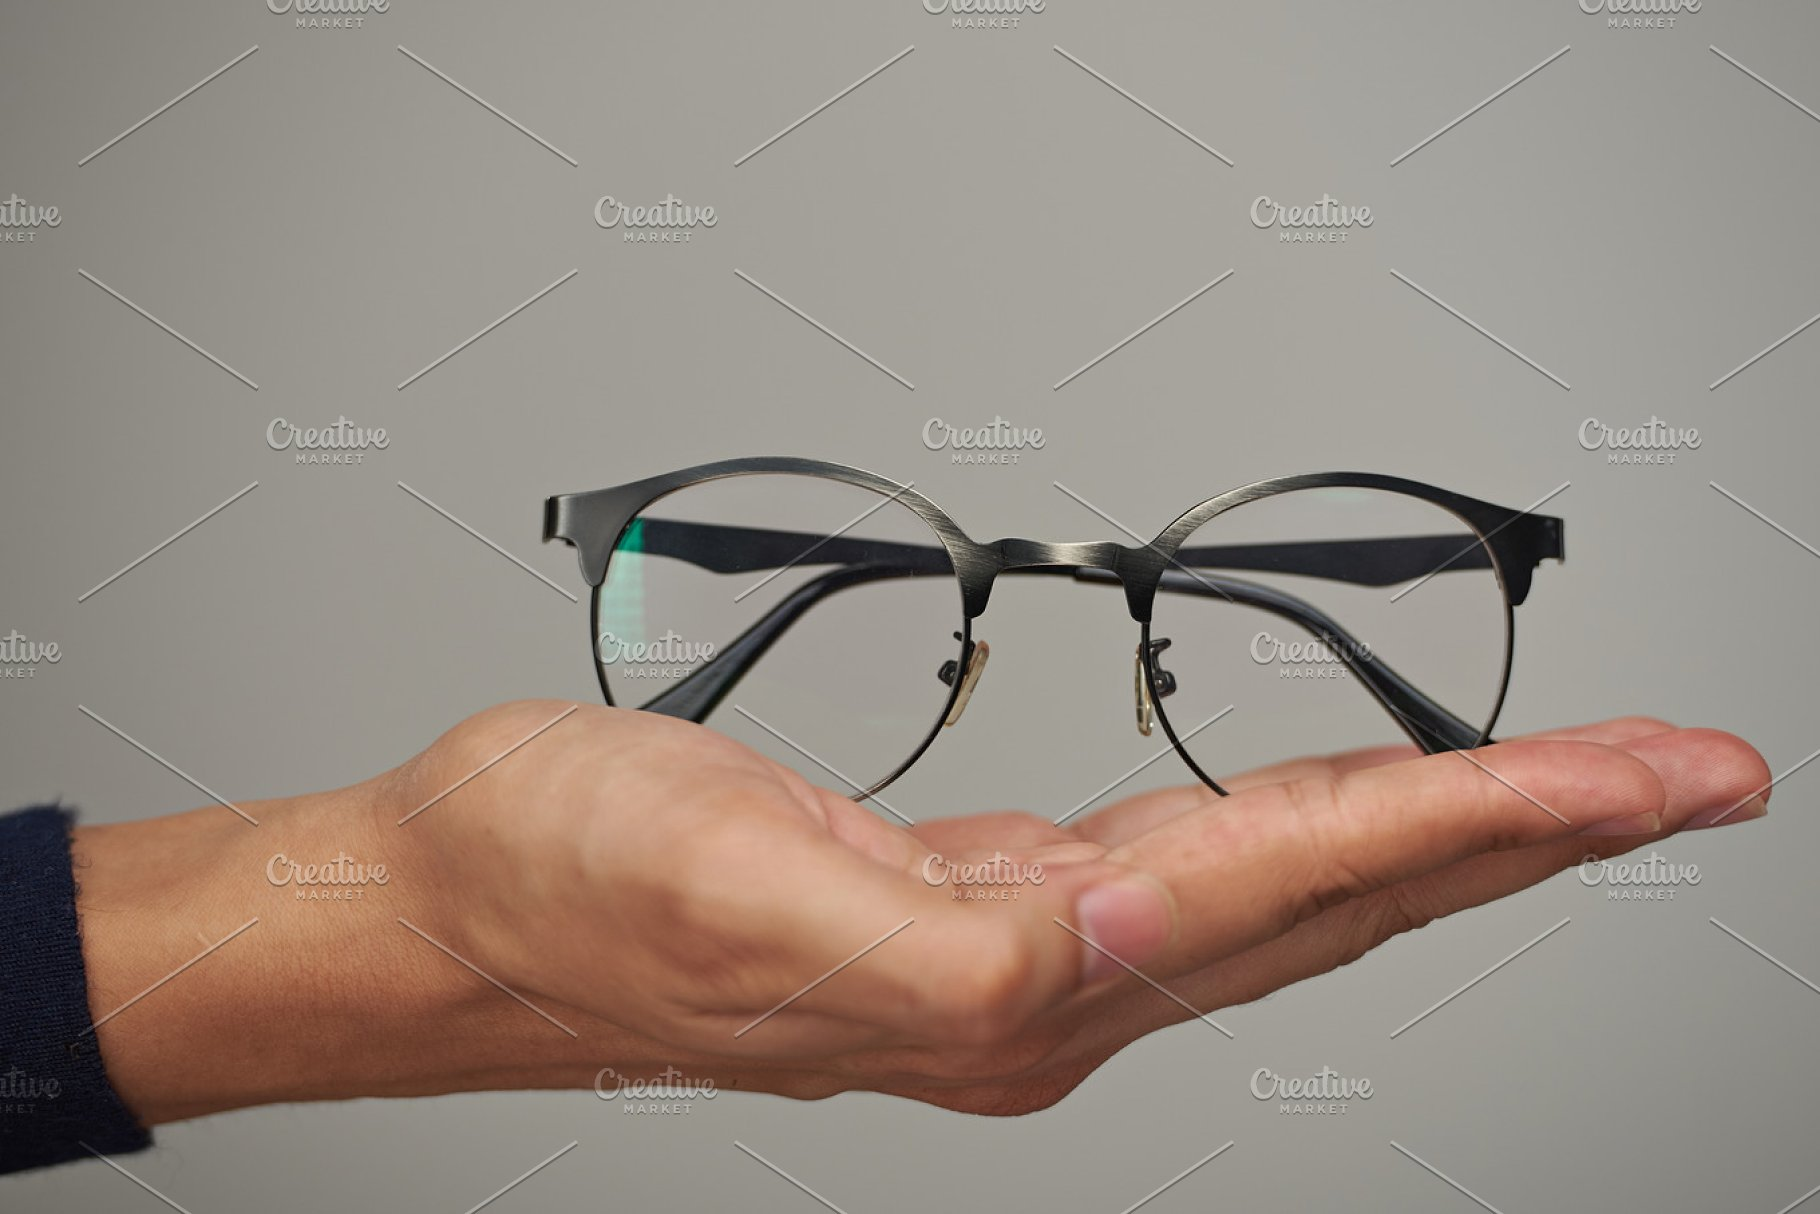 75a39103cdab Glasses on human lay hand ~ Health Photos ~ Creative Market